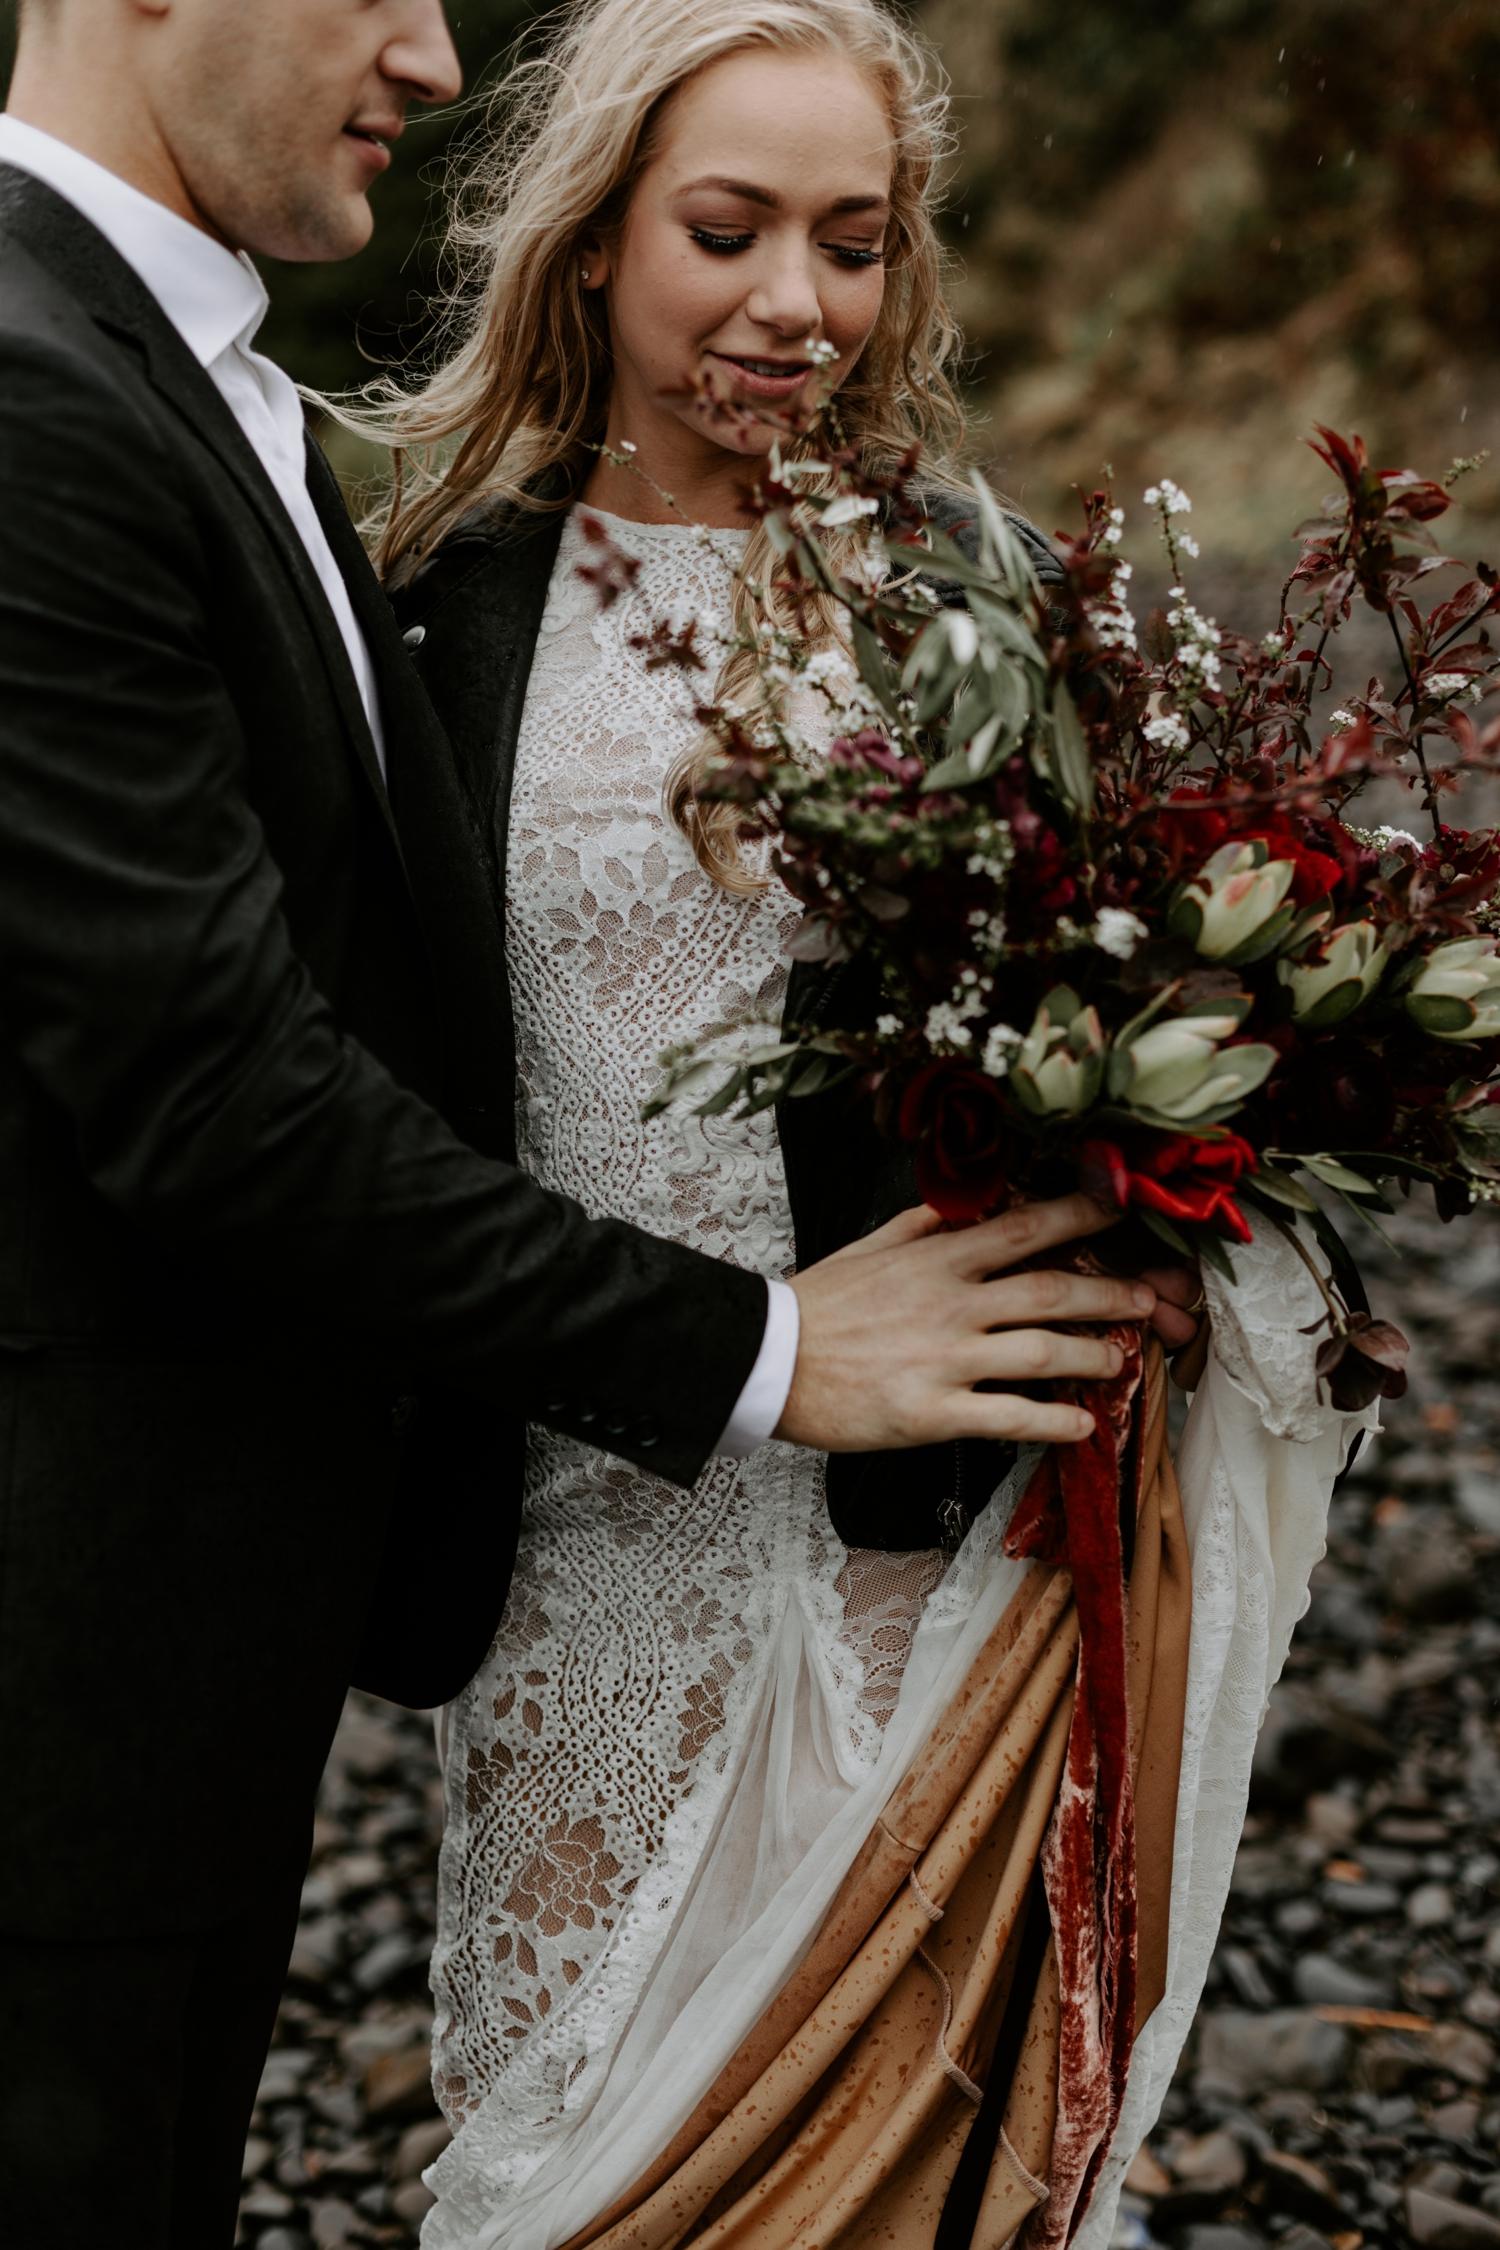 adventurous-oregon-elopement-2018-05-02_0016.jpg